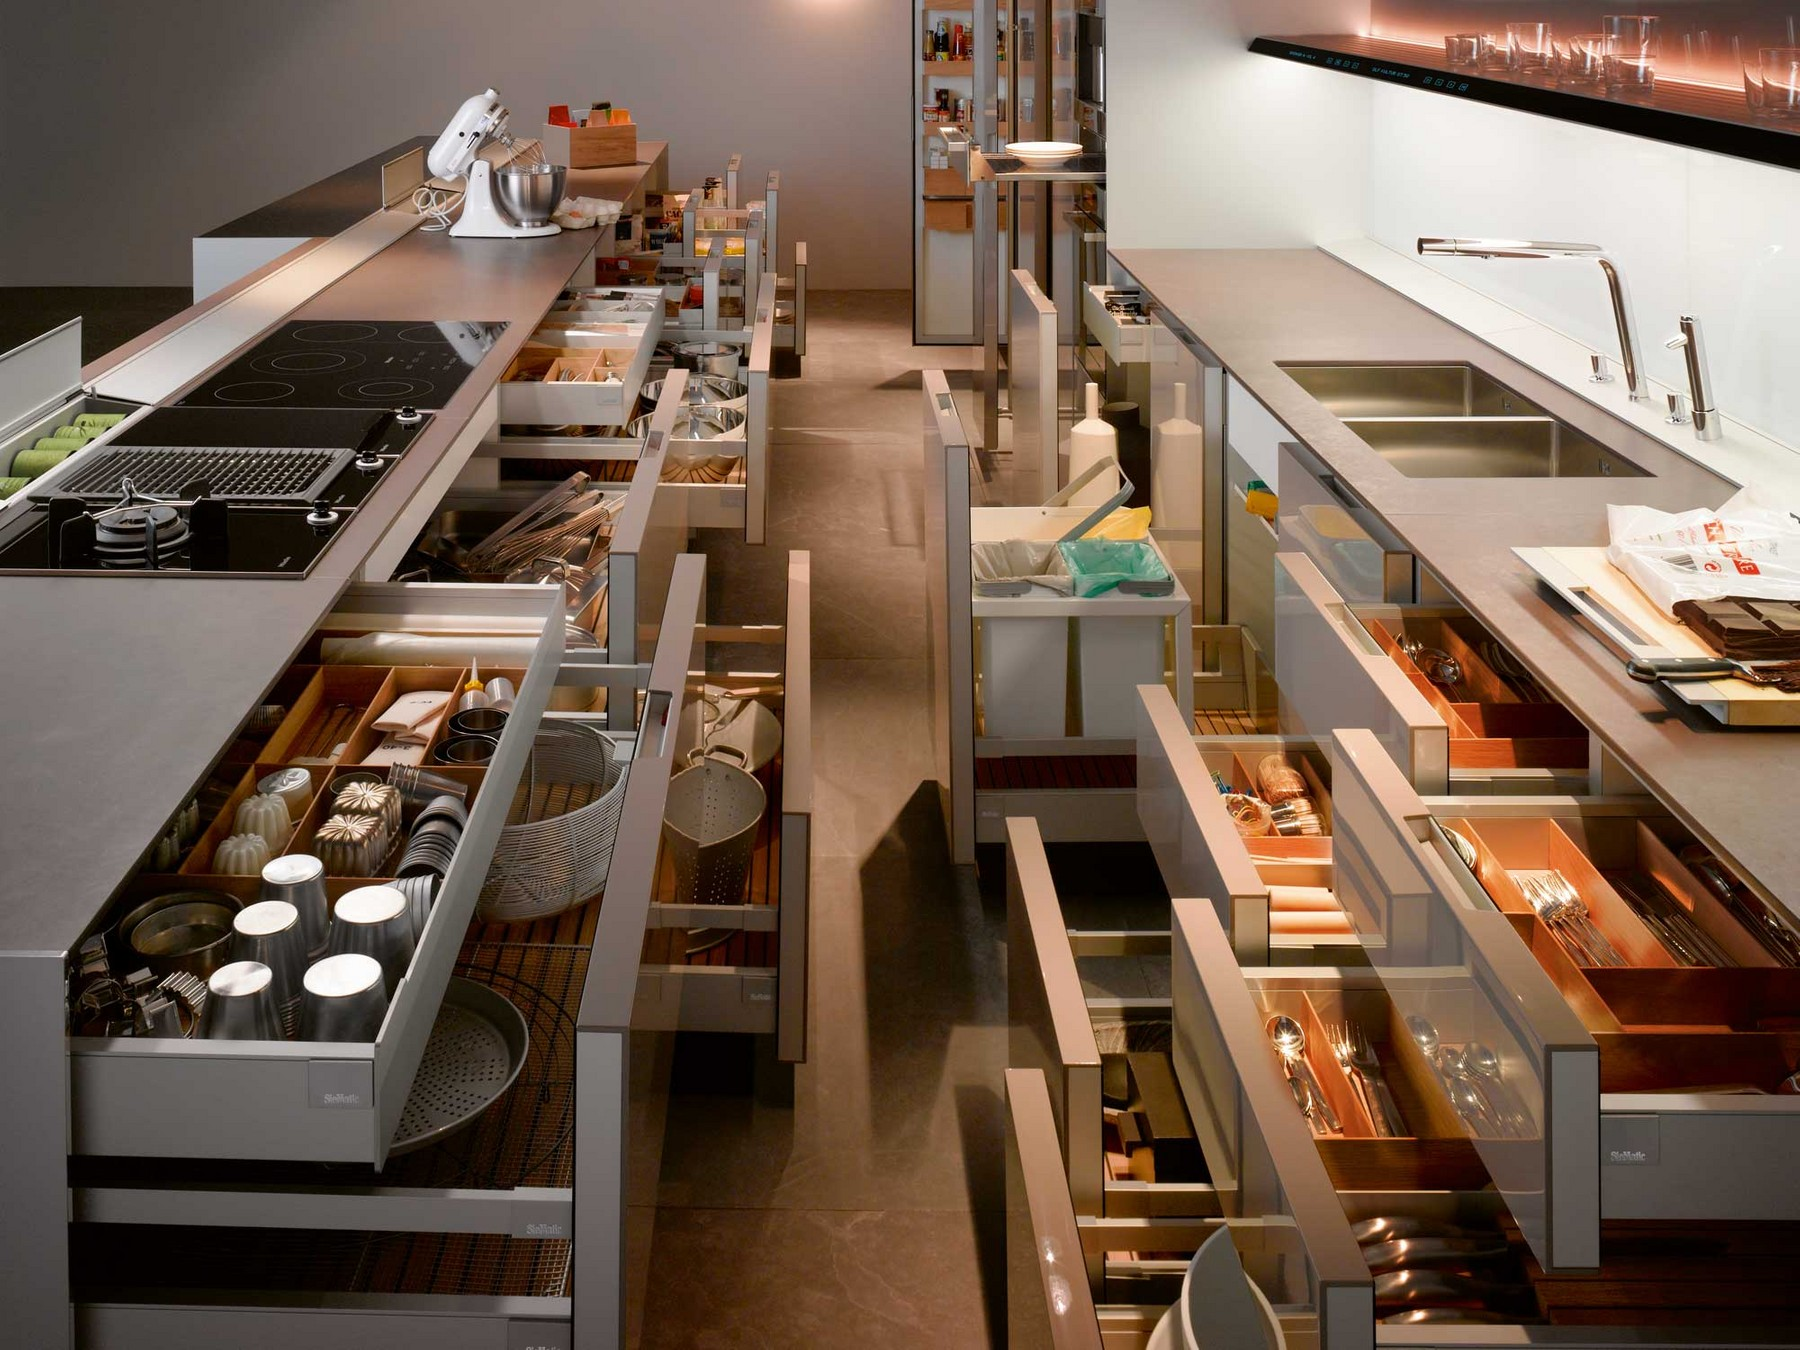 Kitchen by Martin Dettinger